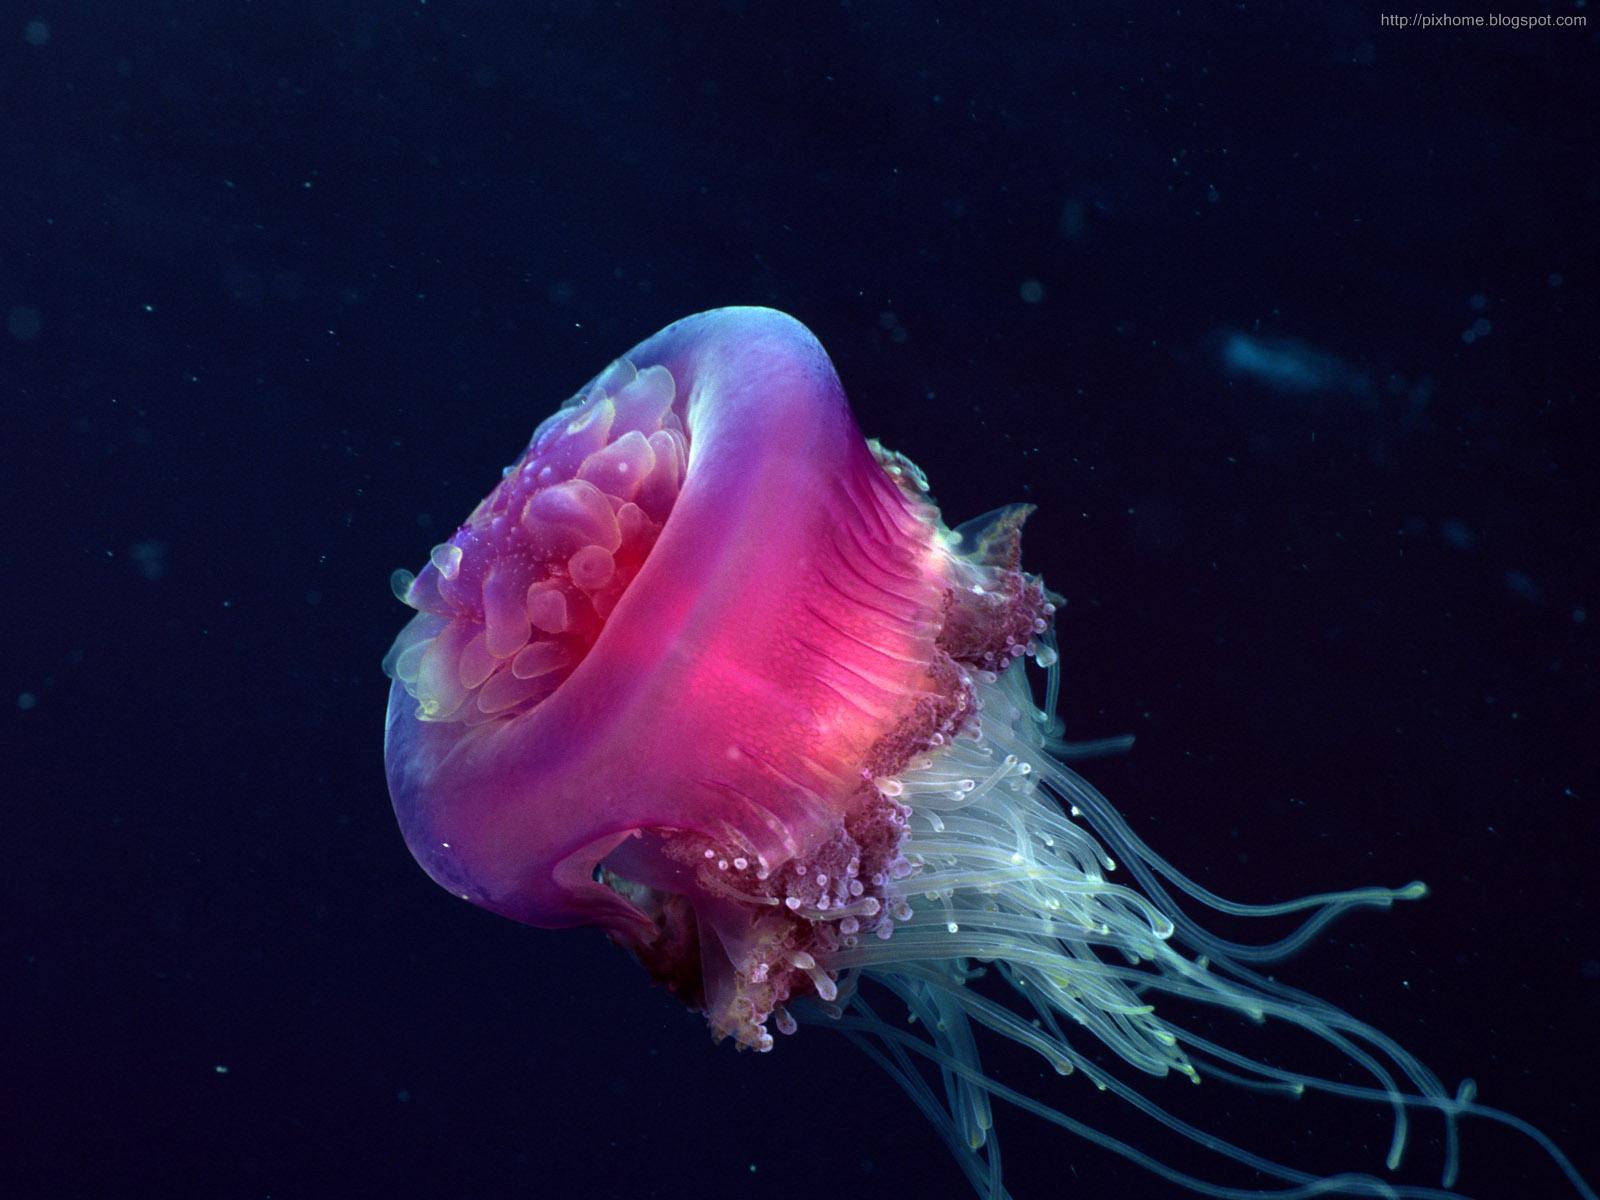 underwater sea animal creatures plants pictures hq 1600x1200